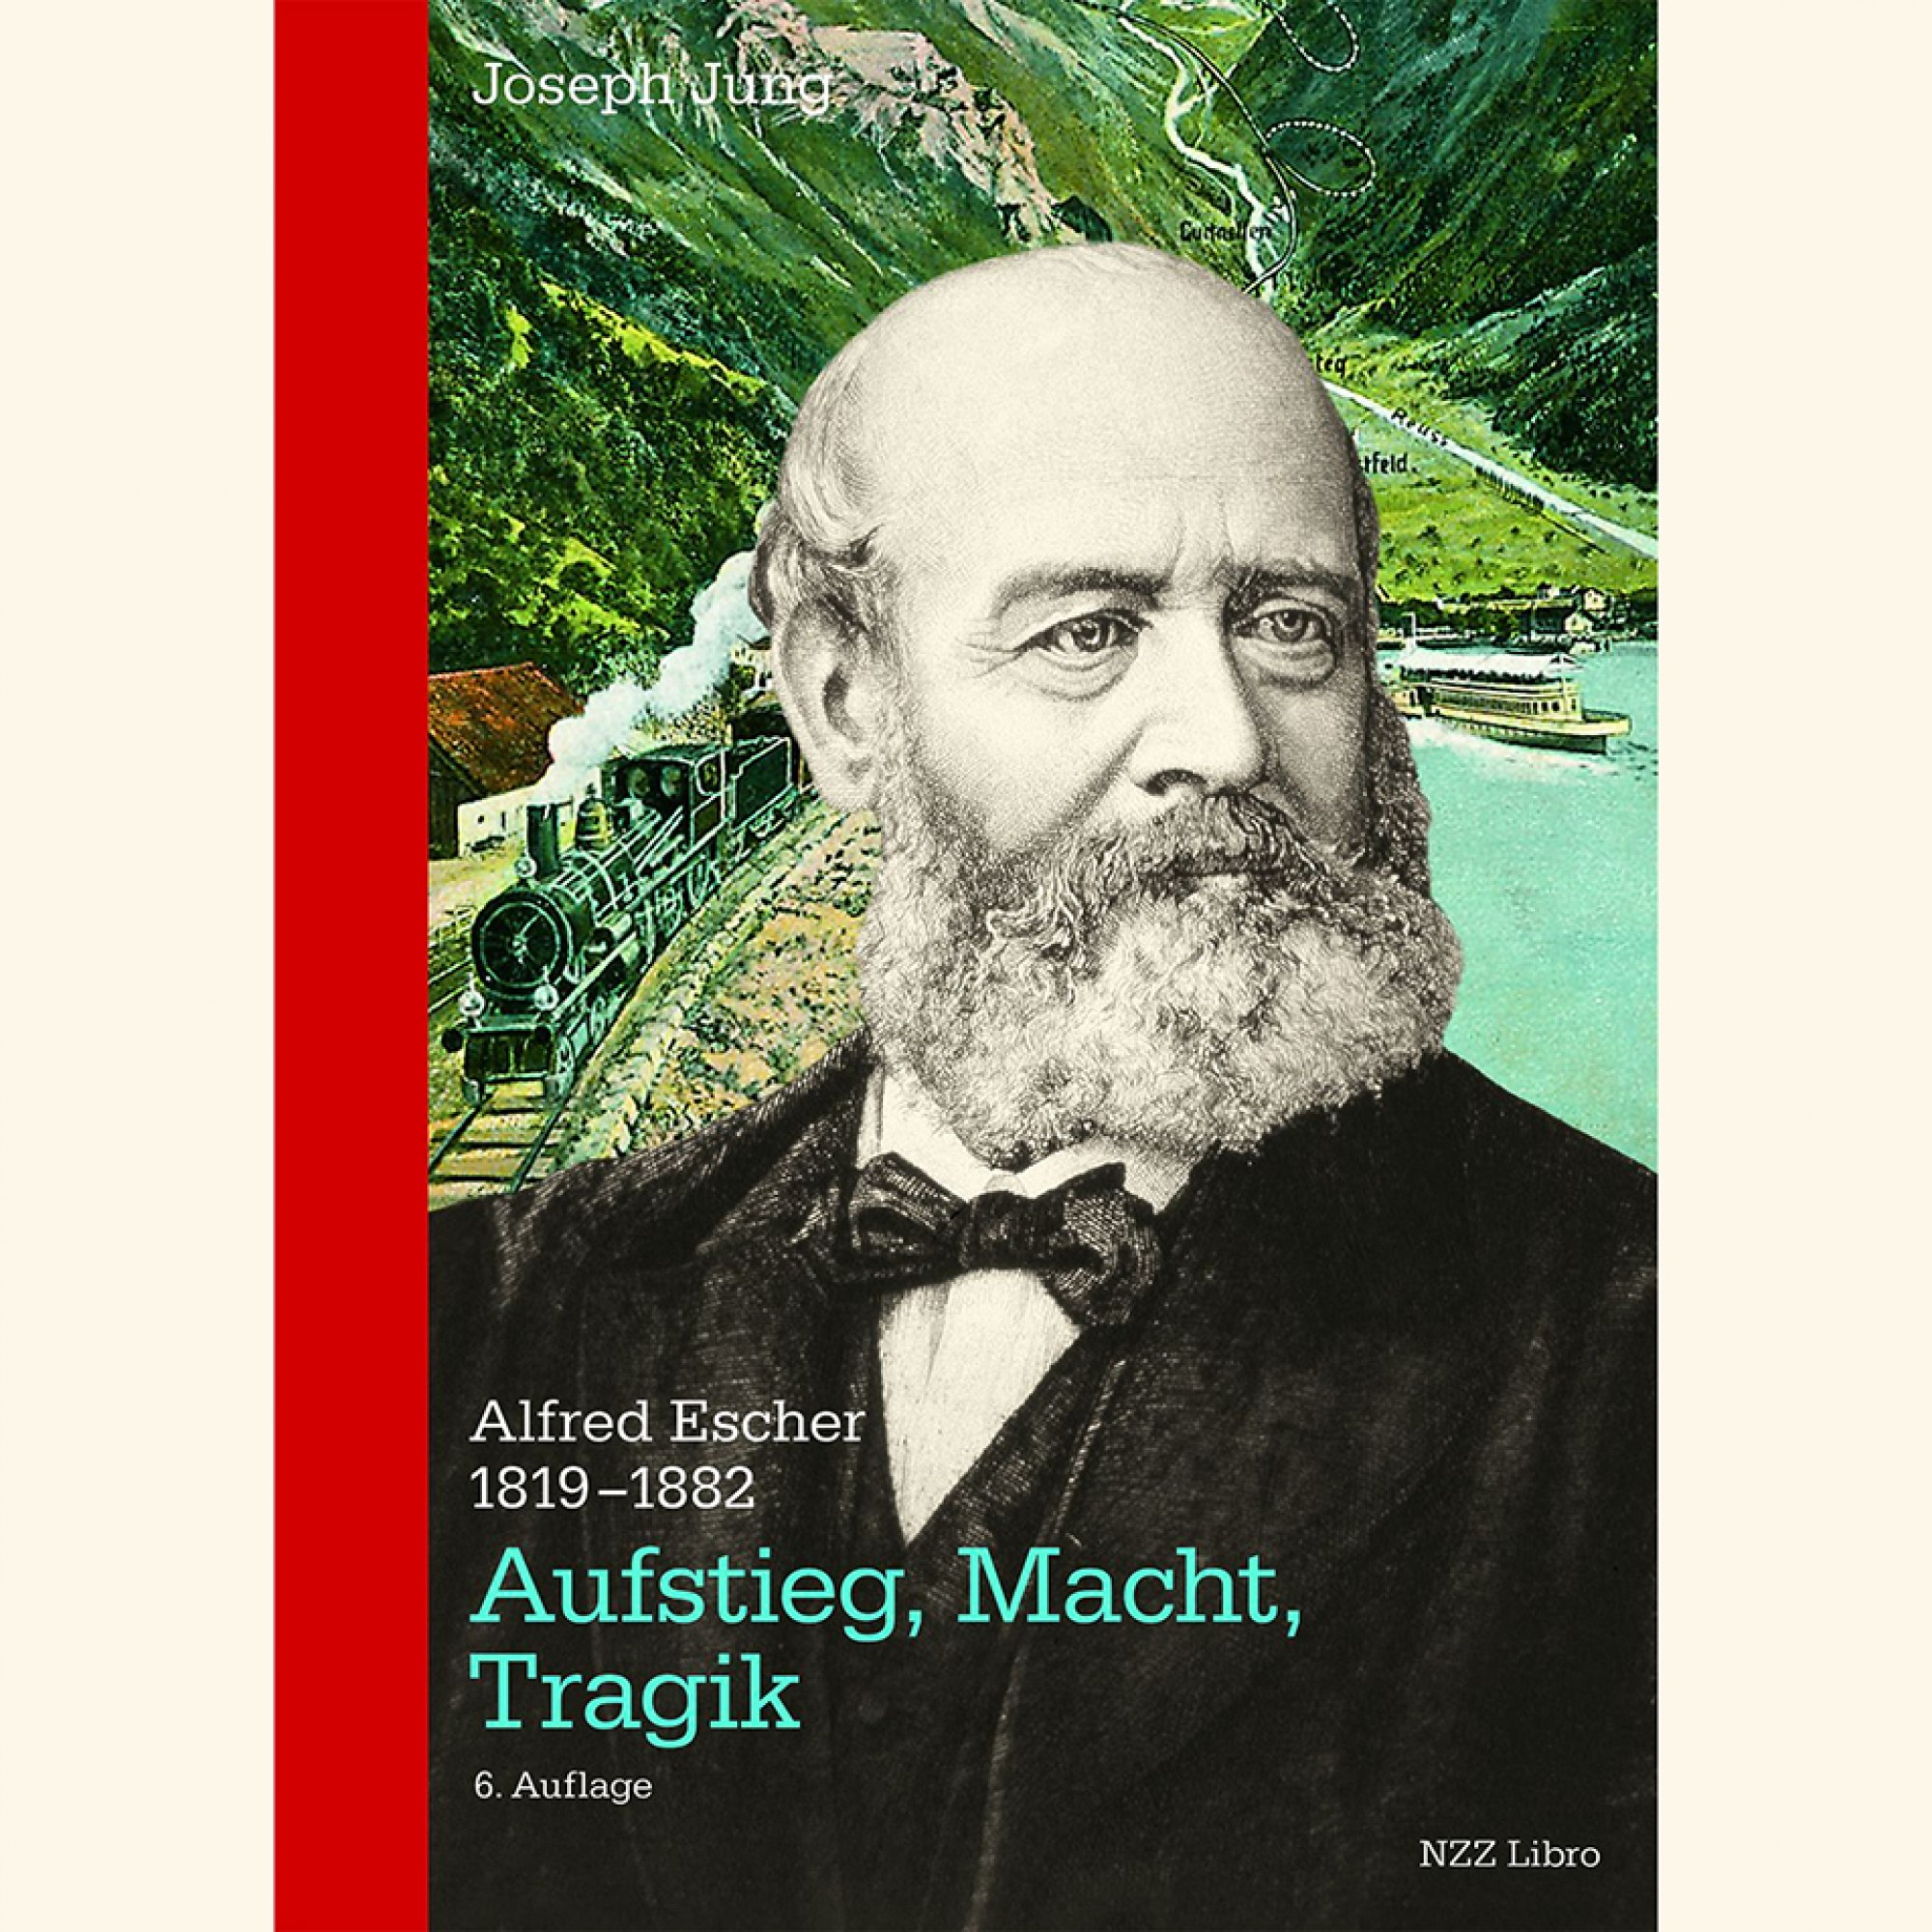 Buchtipp: Alfred Escher –Aufstieg, Macht, Tragik